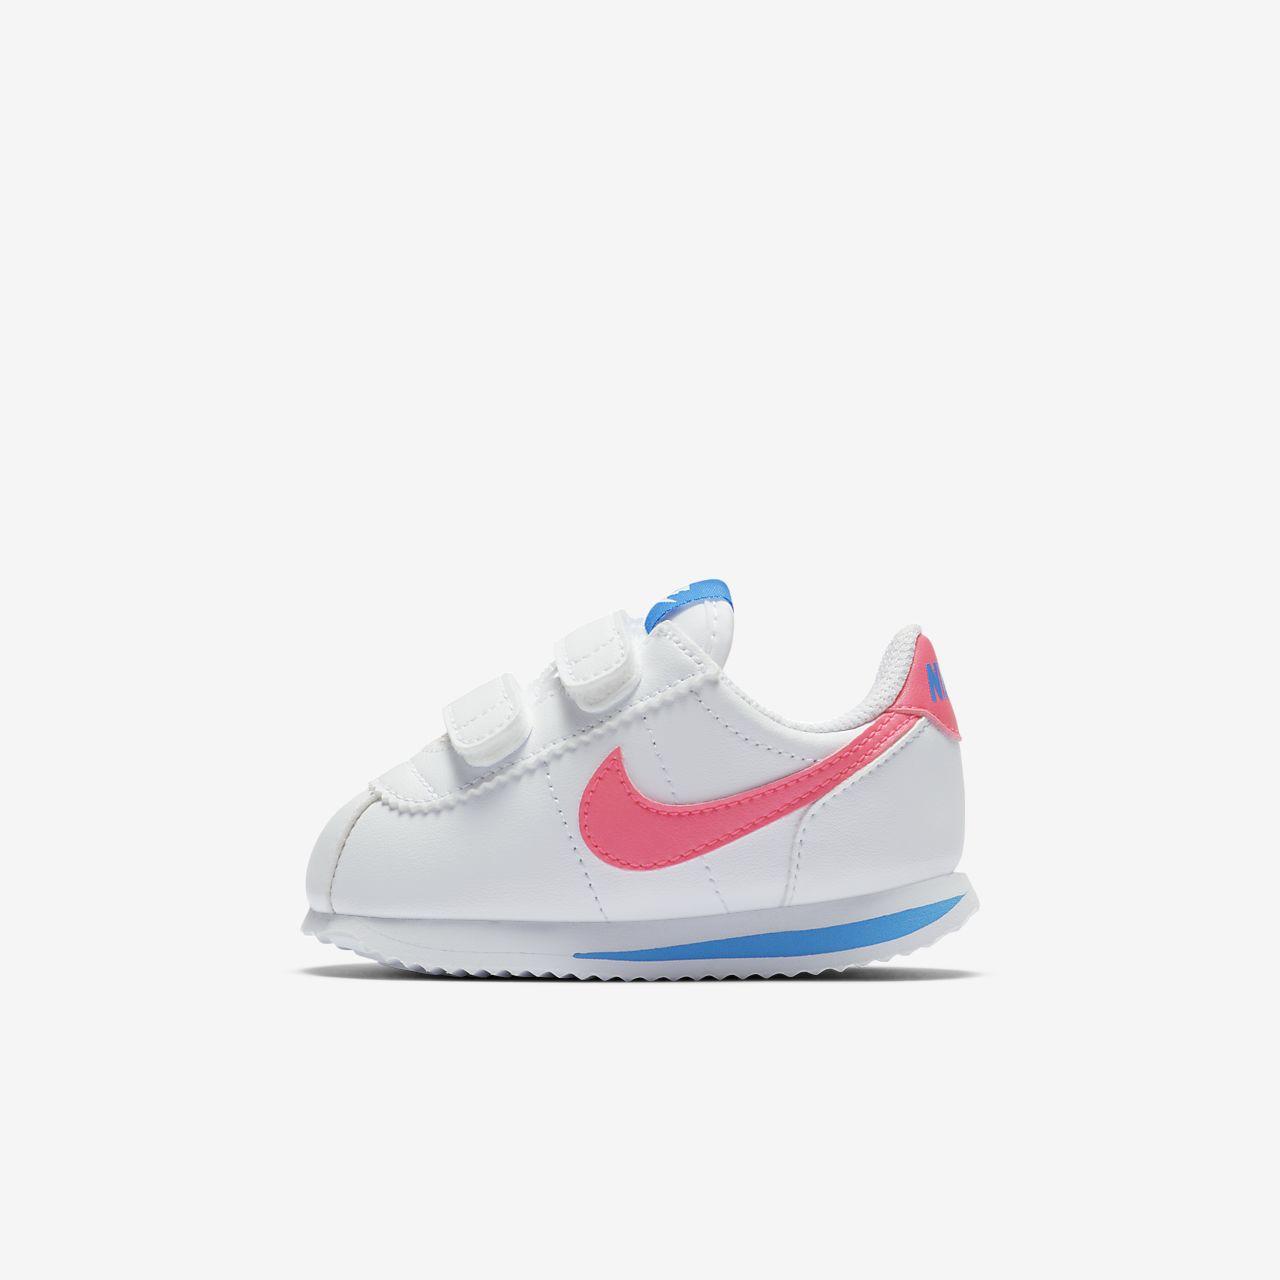 Nike Cortez Basic SL Sabatilles - Nadó i infant